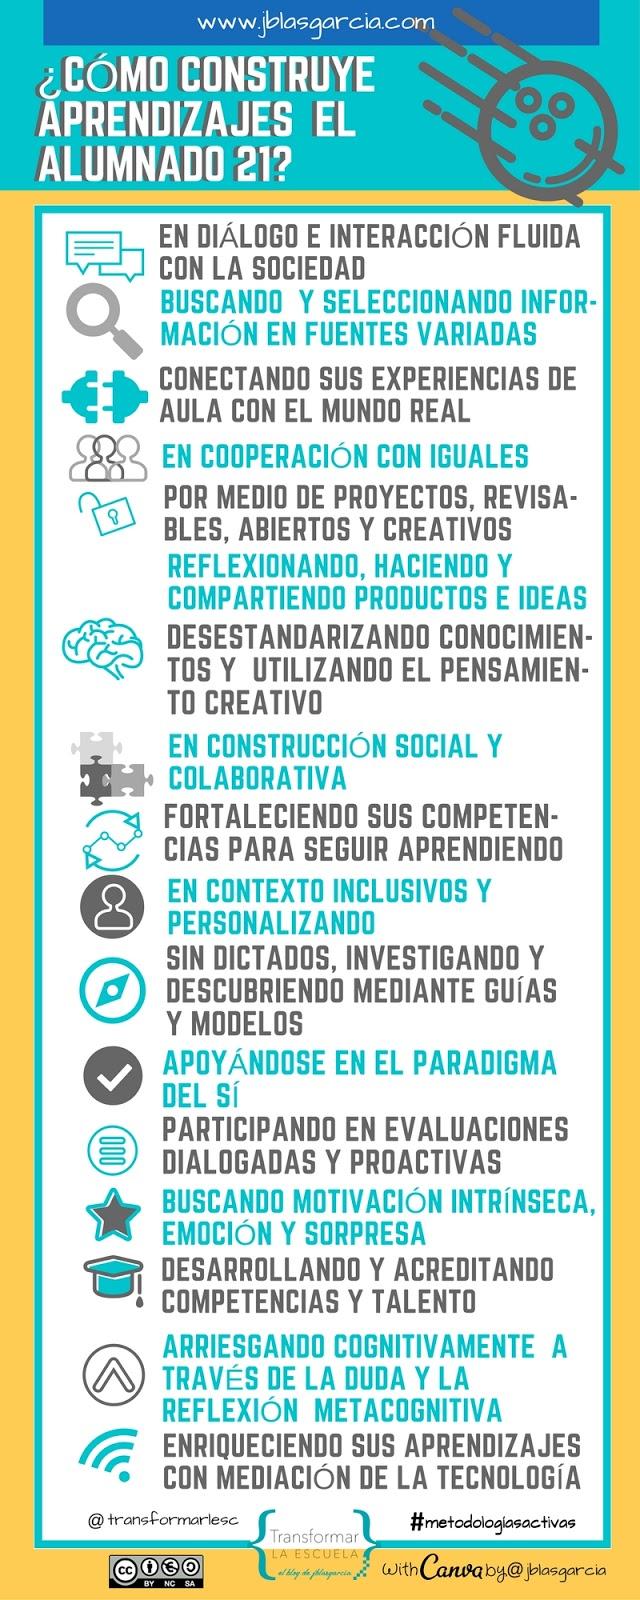 comoconstruiraprendizajesalumnossigloxxi-infografia-bloggesvin